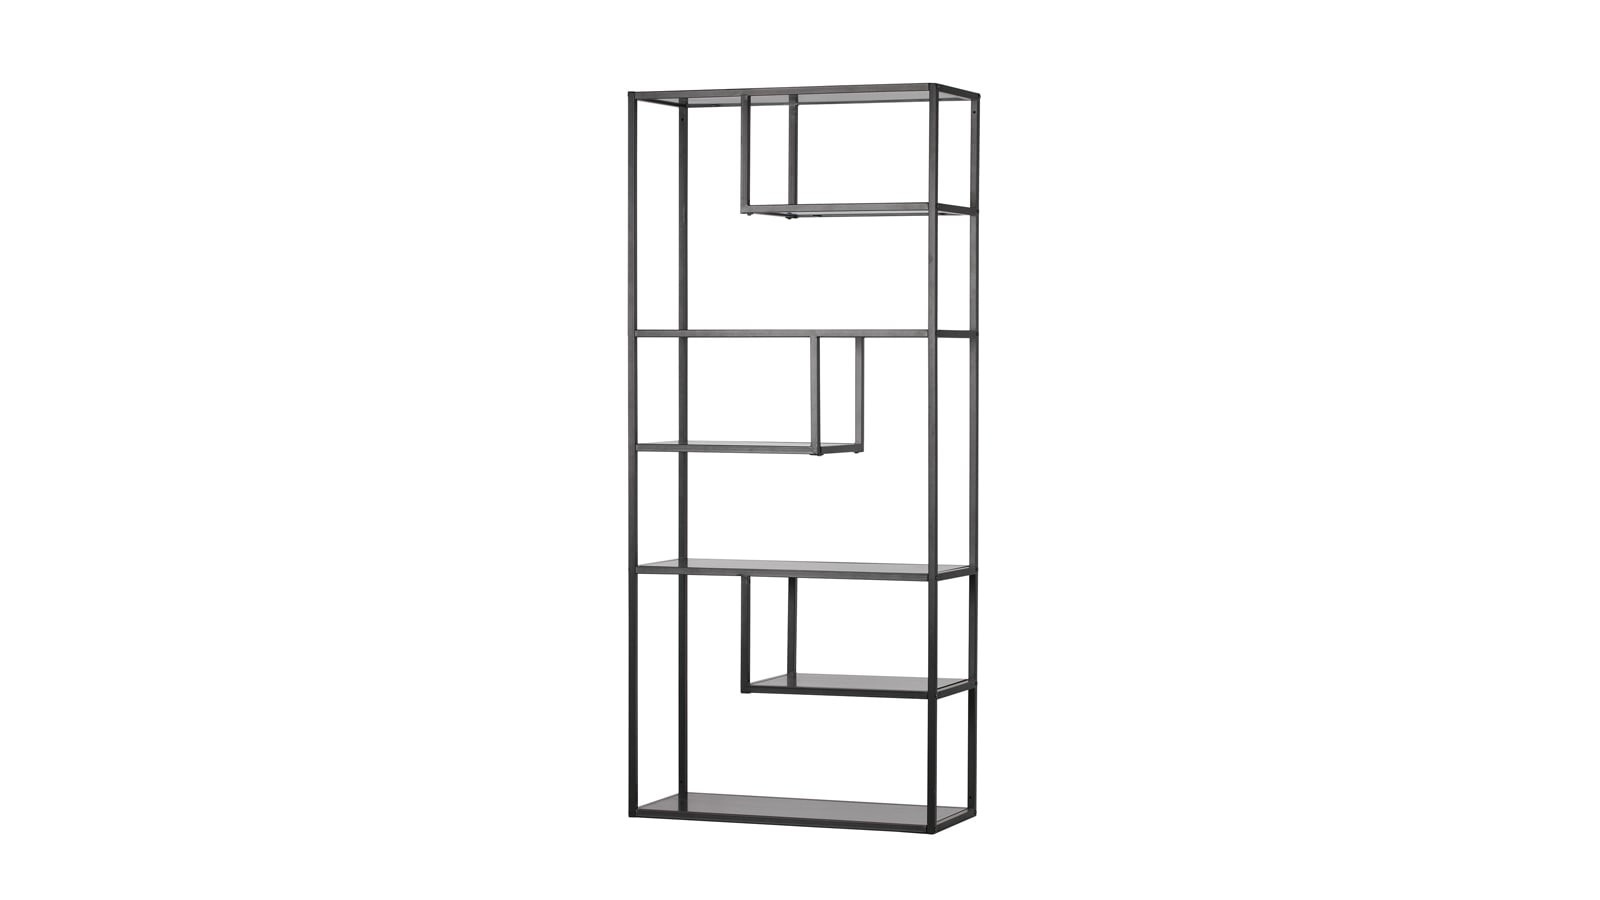 biblioth que cases en m tal noir collection teun woood homifab. Black Bedroom Furniture Sets. Home Design Ideas